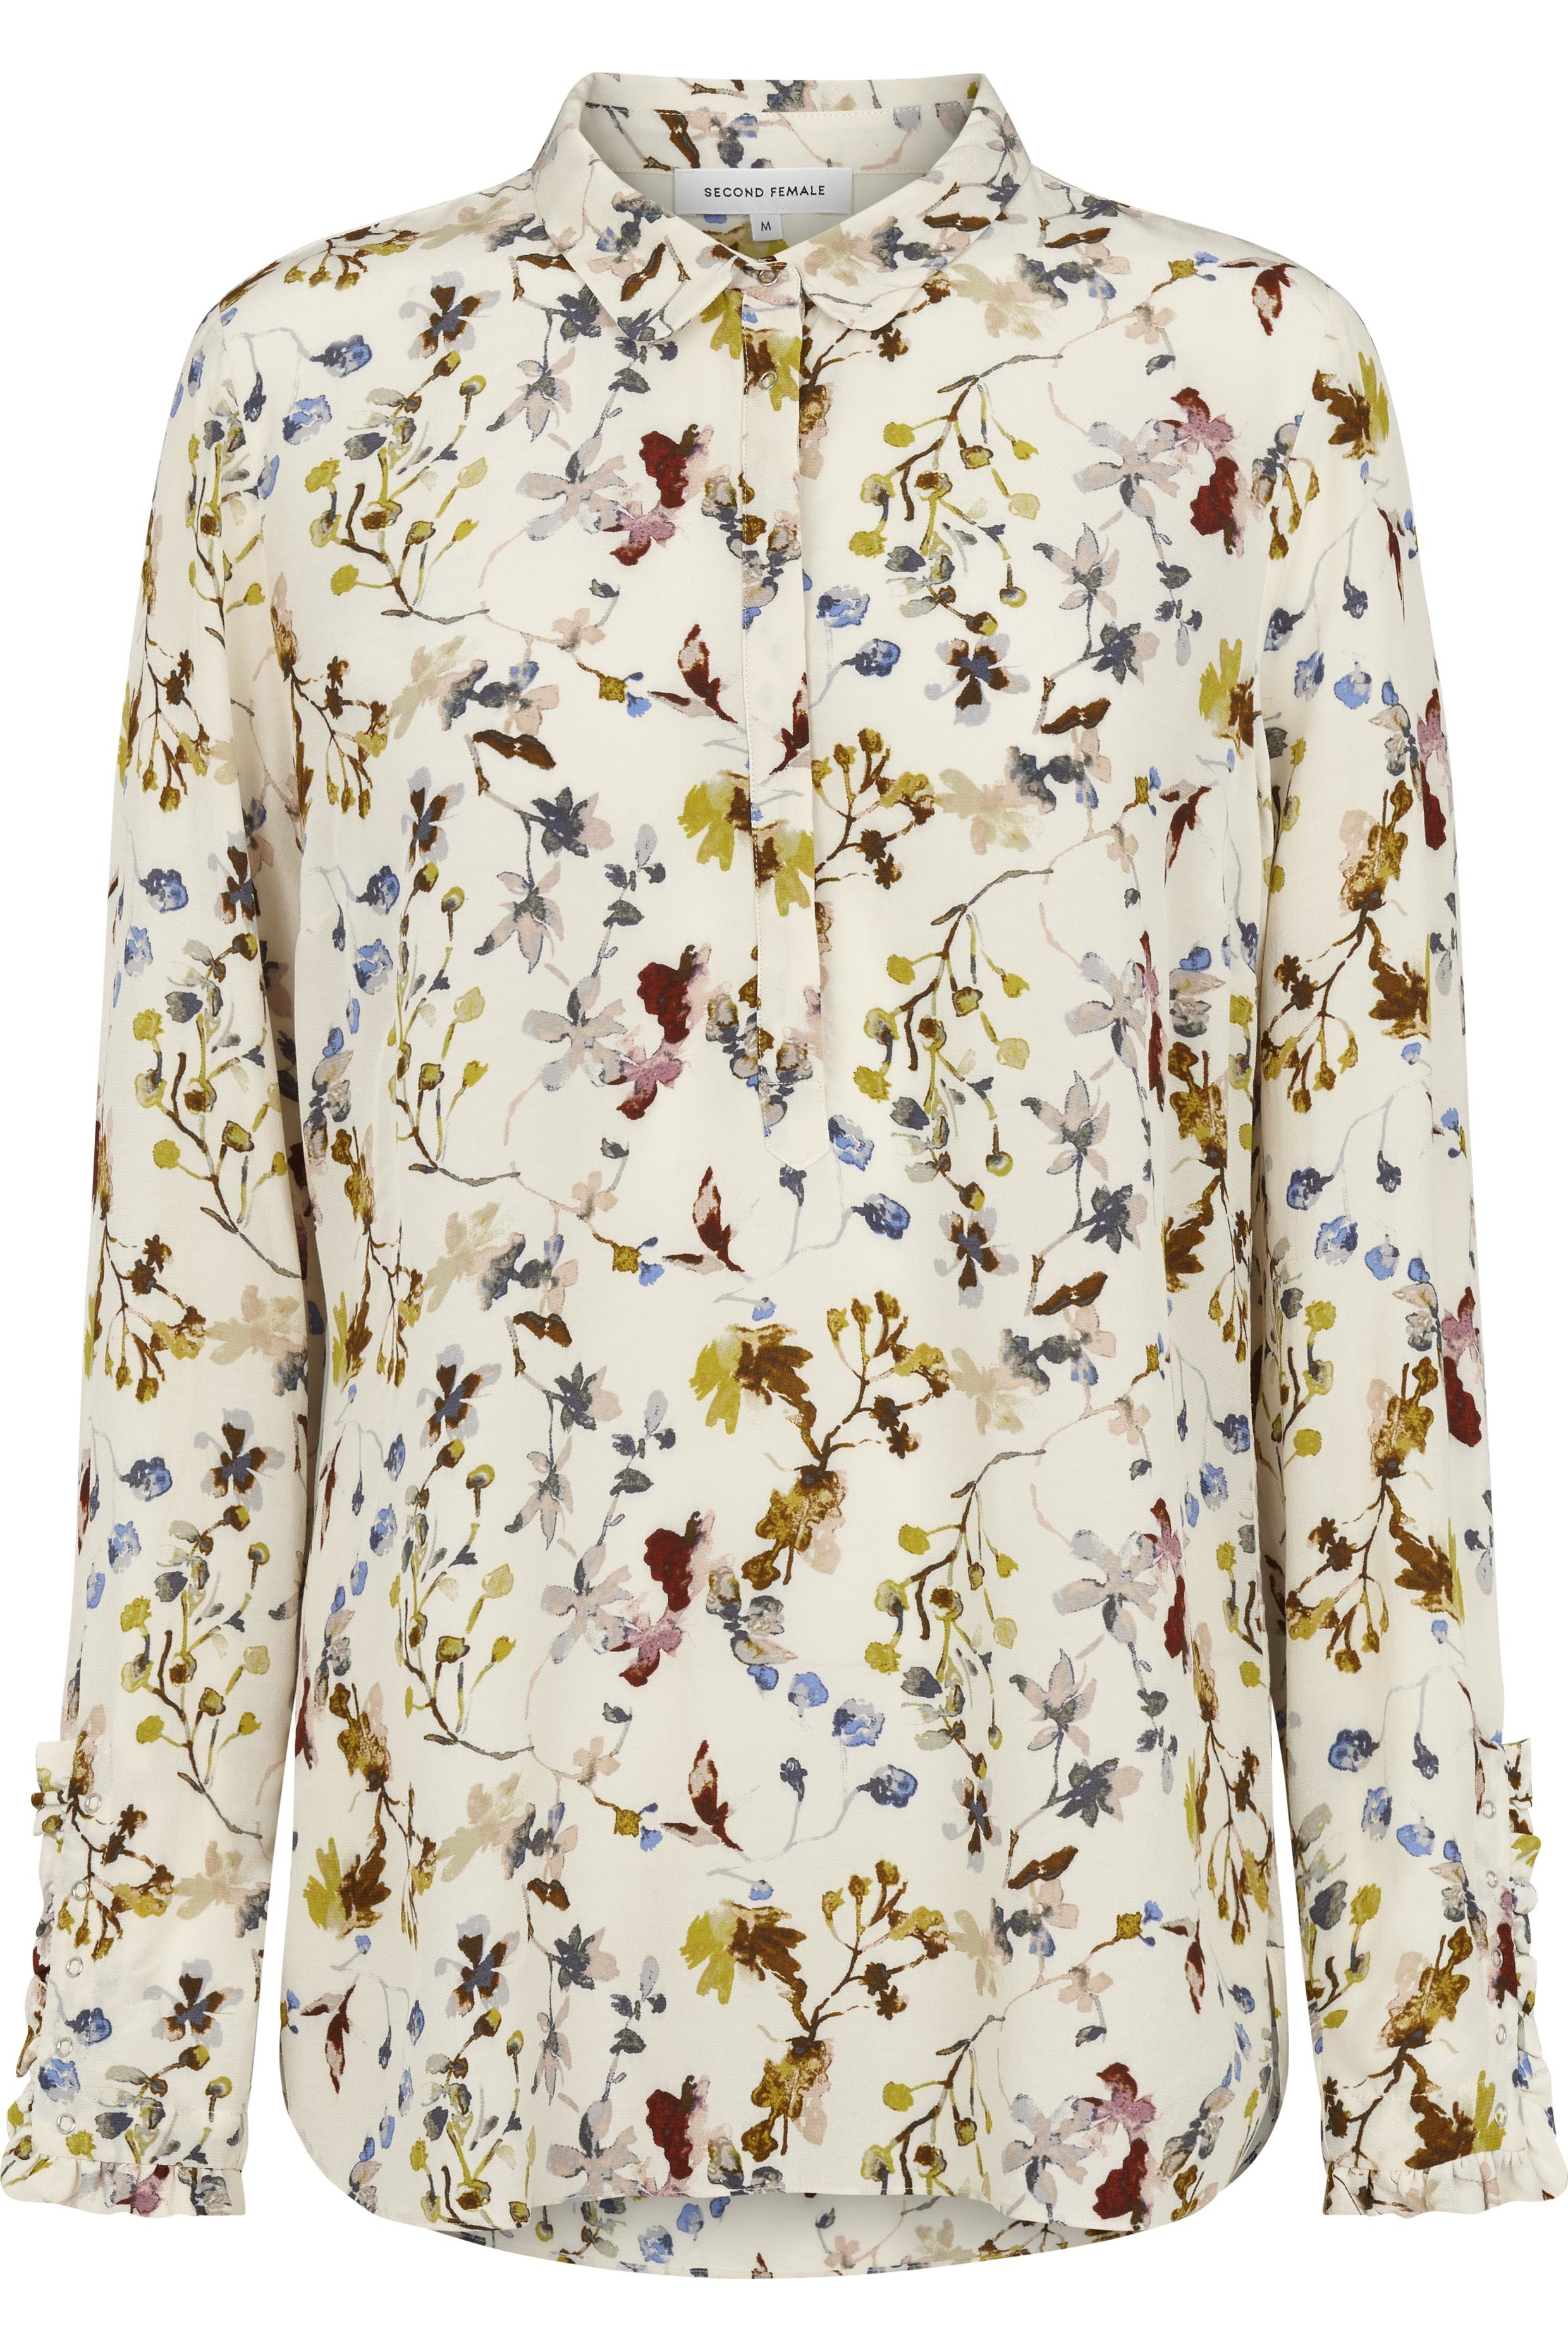 917c1411 Off white bluse med blomster i fine farger fra Second Female – Second Female  Scarlet bluse